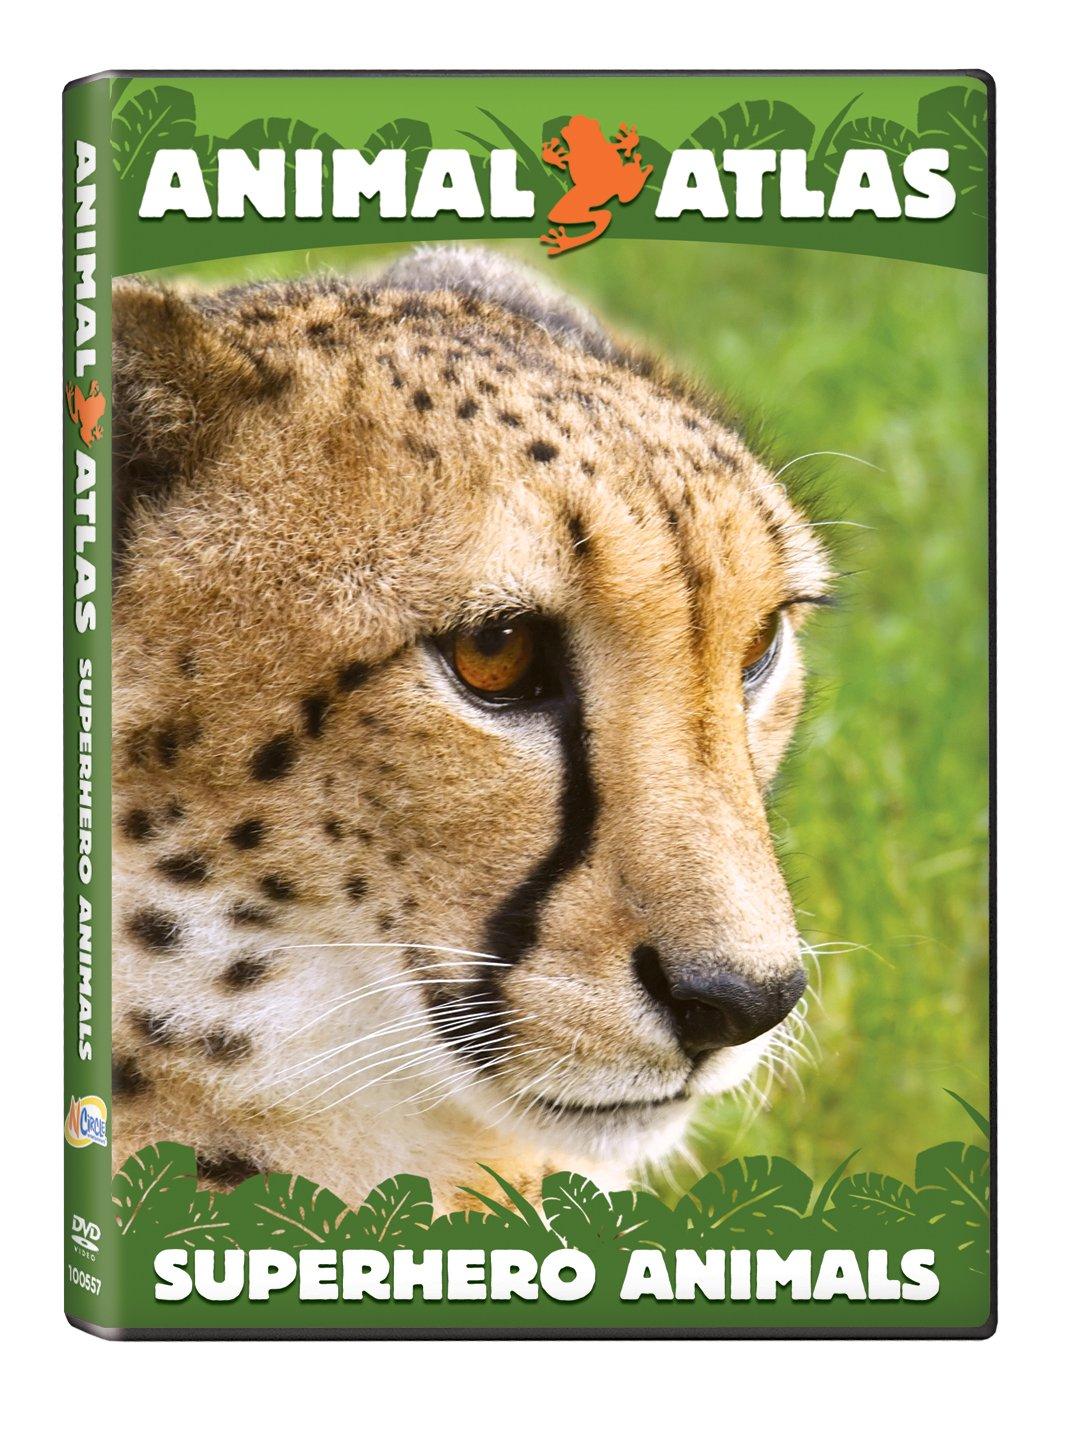 Animal Atlas: Super Hero Animals by Amazon